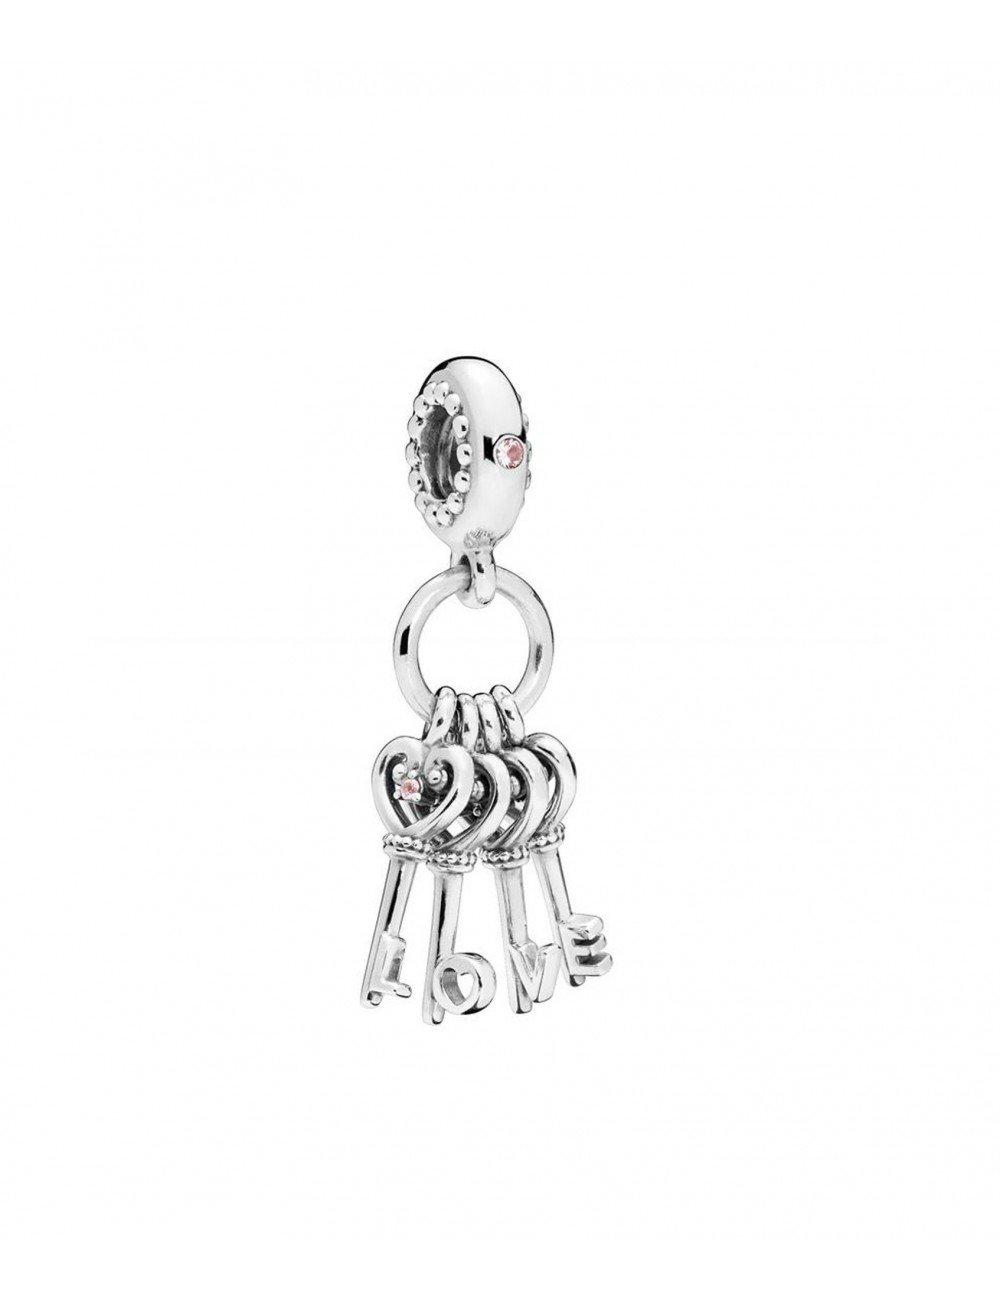 ec85a7b4593b Comprar Pandora Silver Charm Circonita Llaves